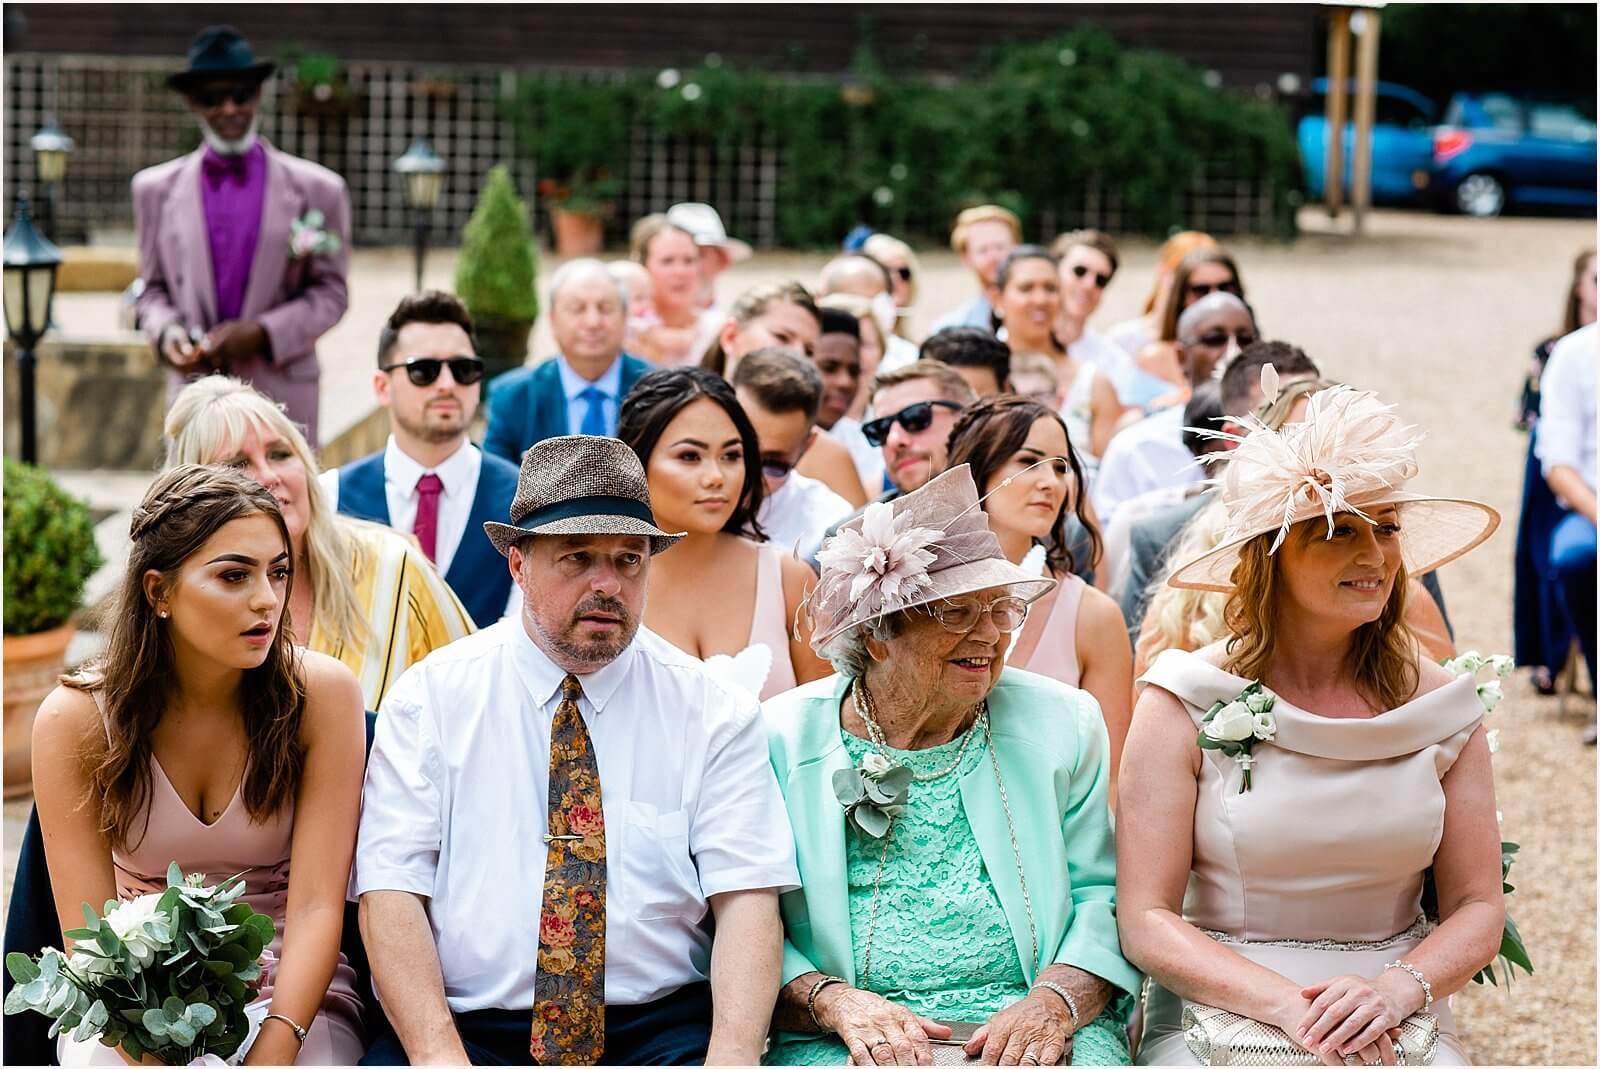 Swallows Oast Wedding - Jakki + Luke's barn wedding photography 25